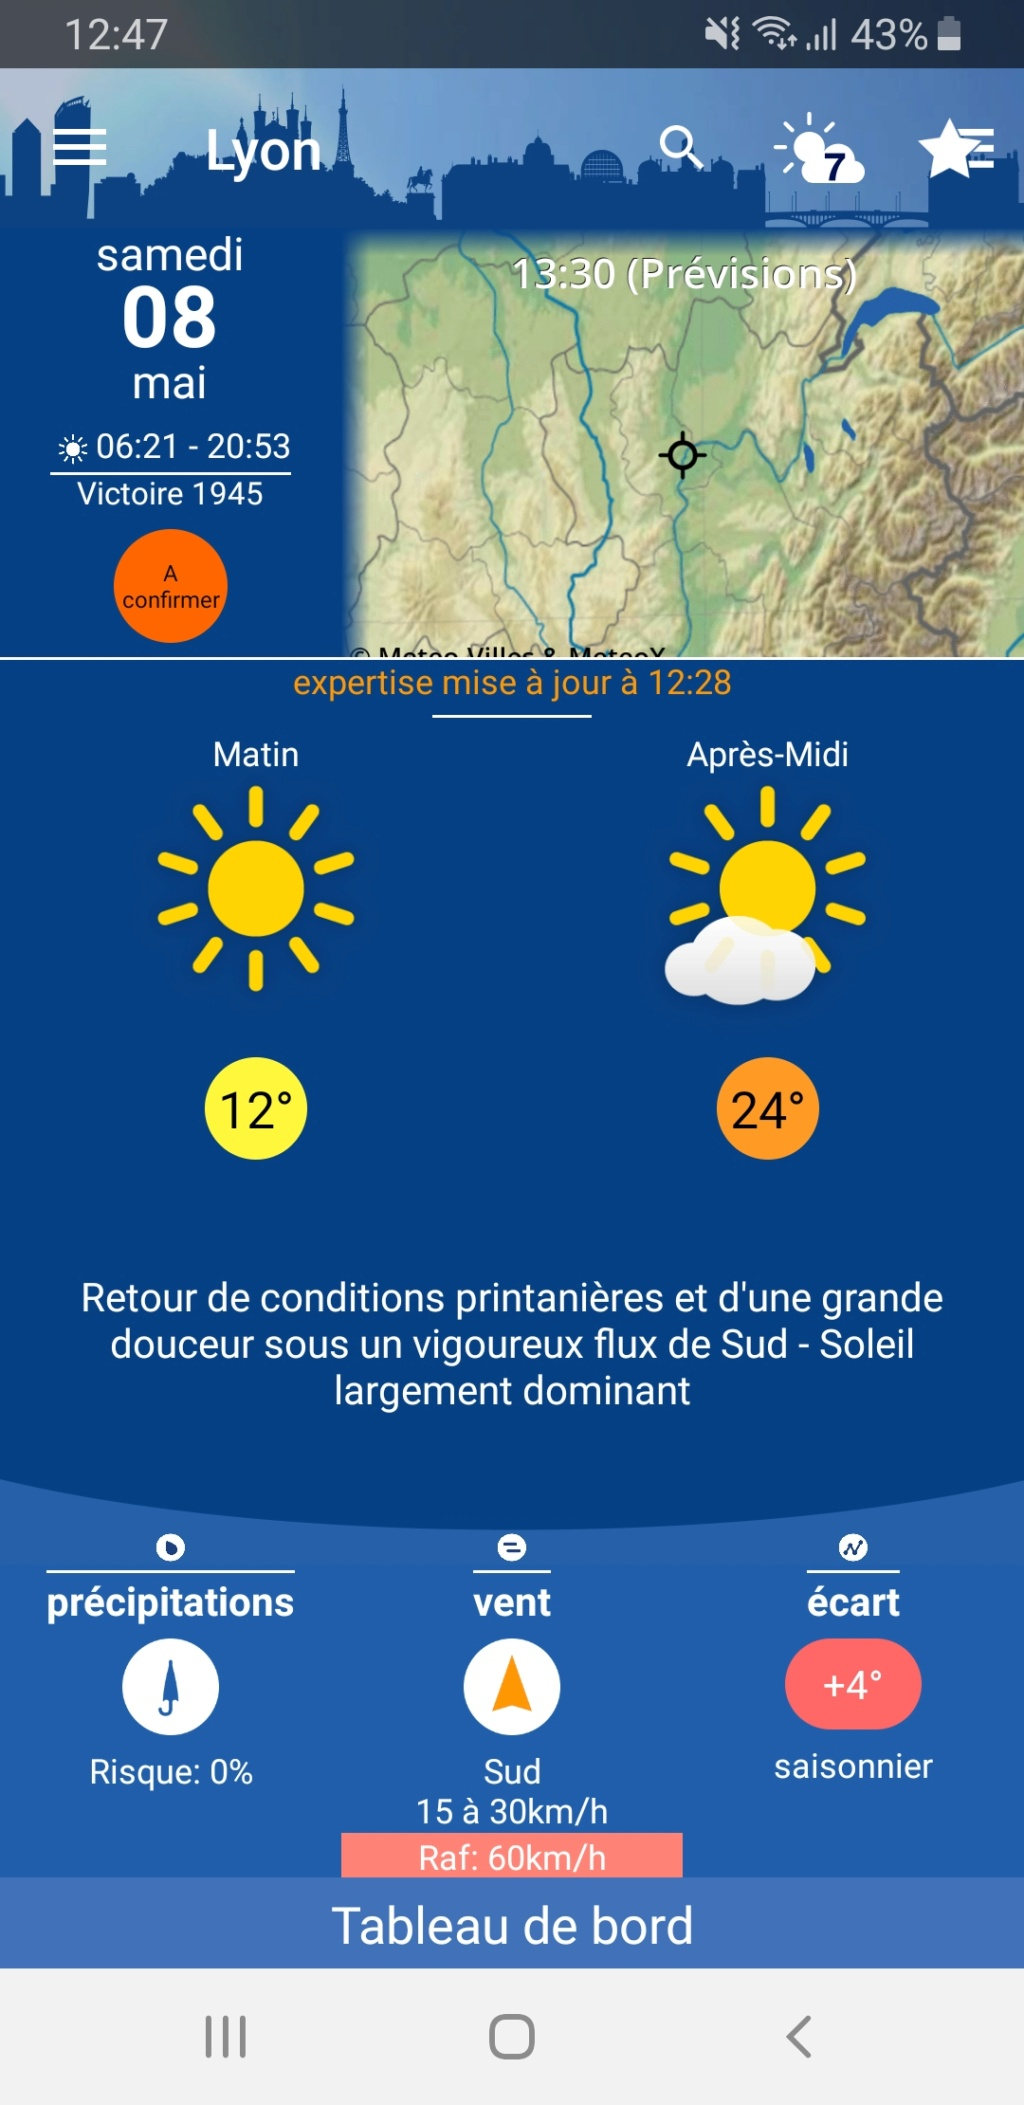 Visue 8 mai Rhône-Alpes - Page 2 Scree315